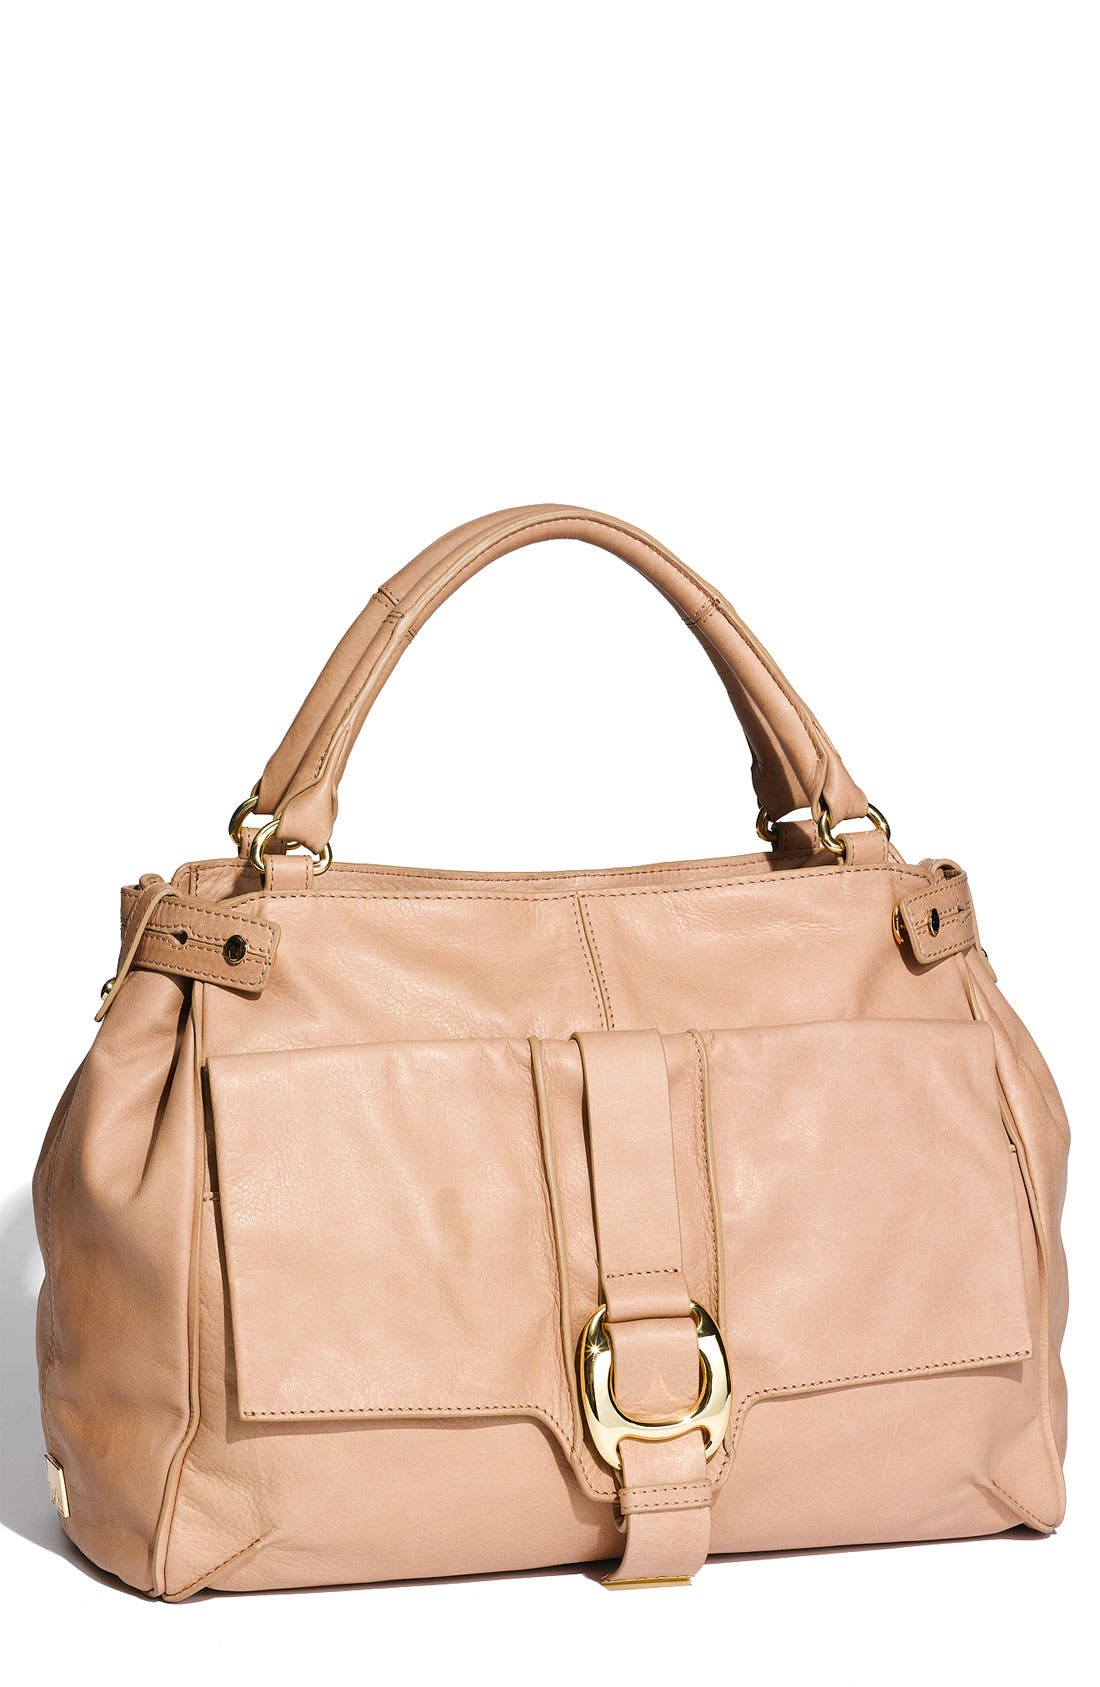 Alternate Image 1 Selected - Kooba 'Anya' Leather Satchel